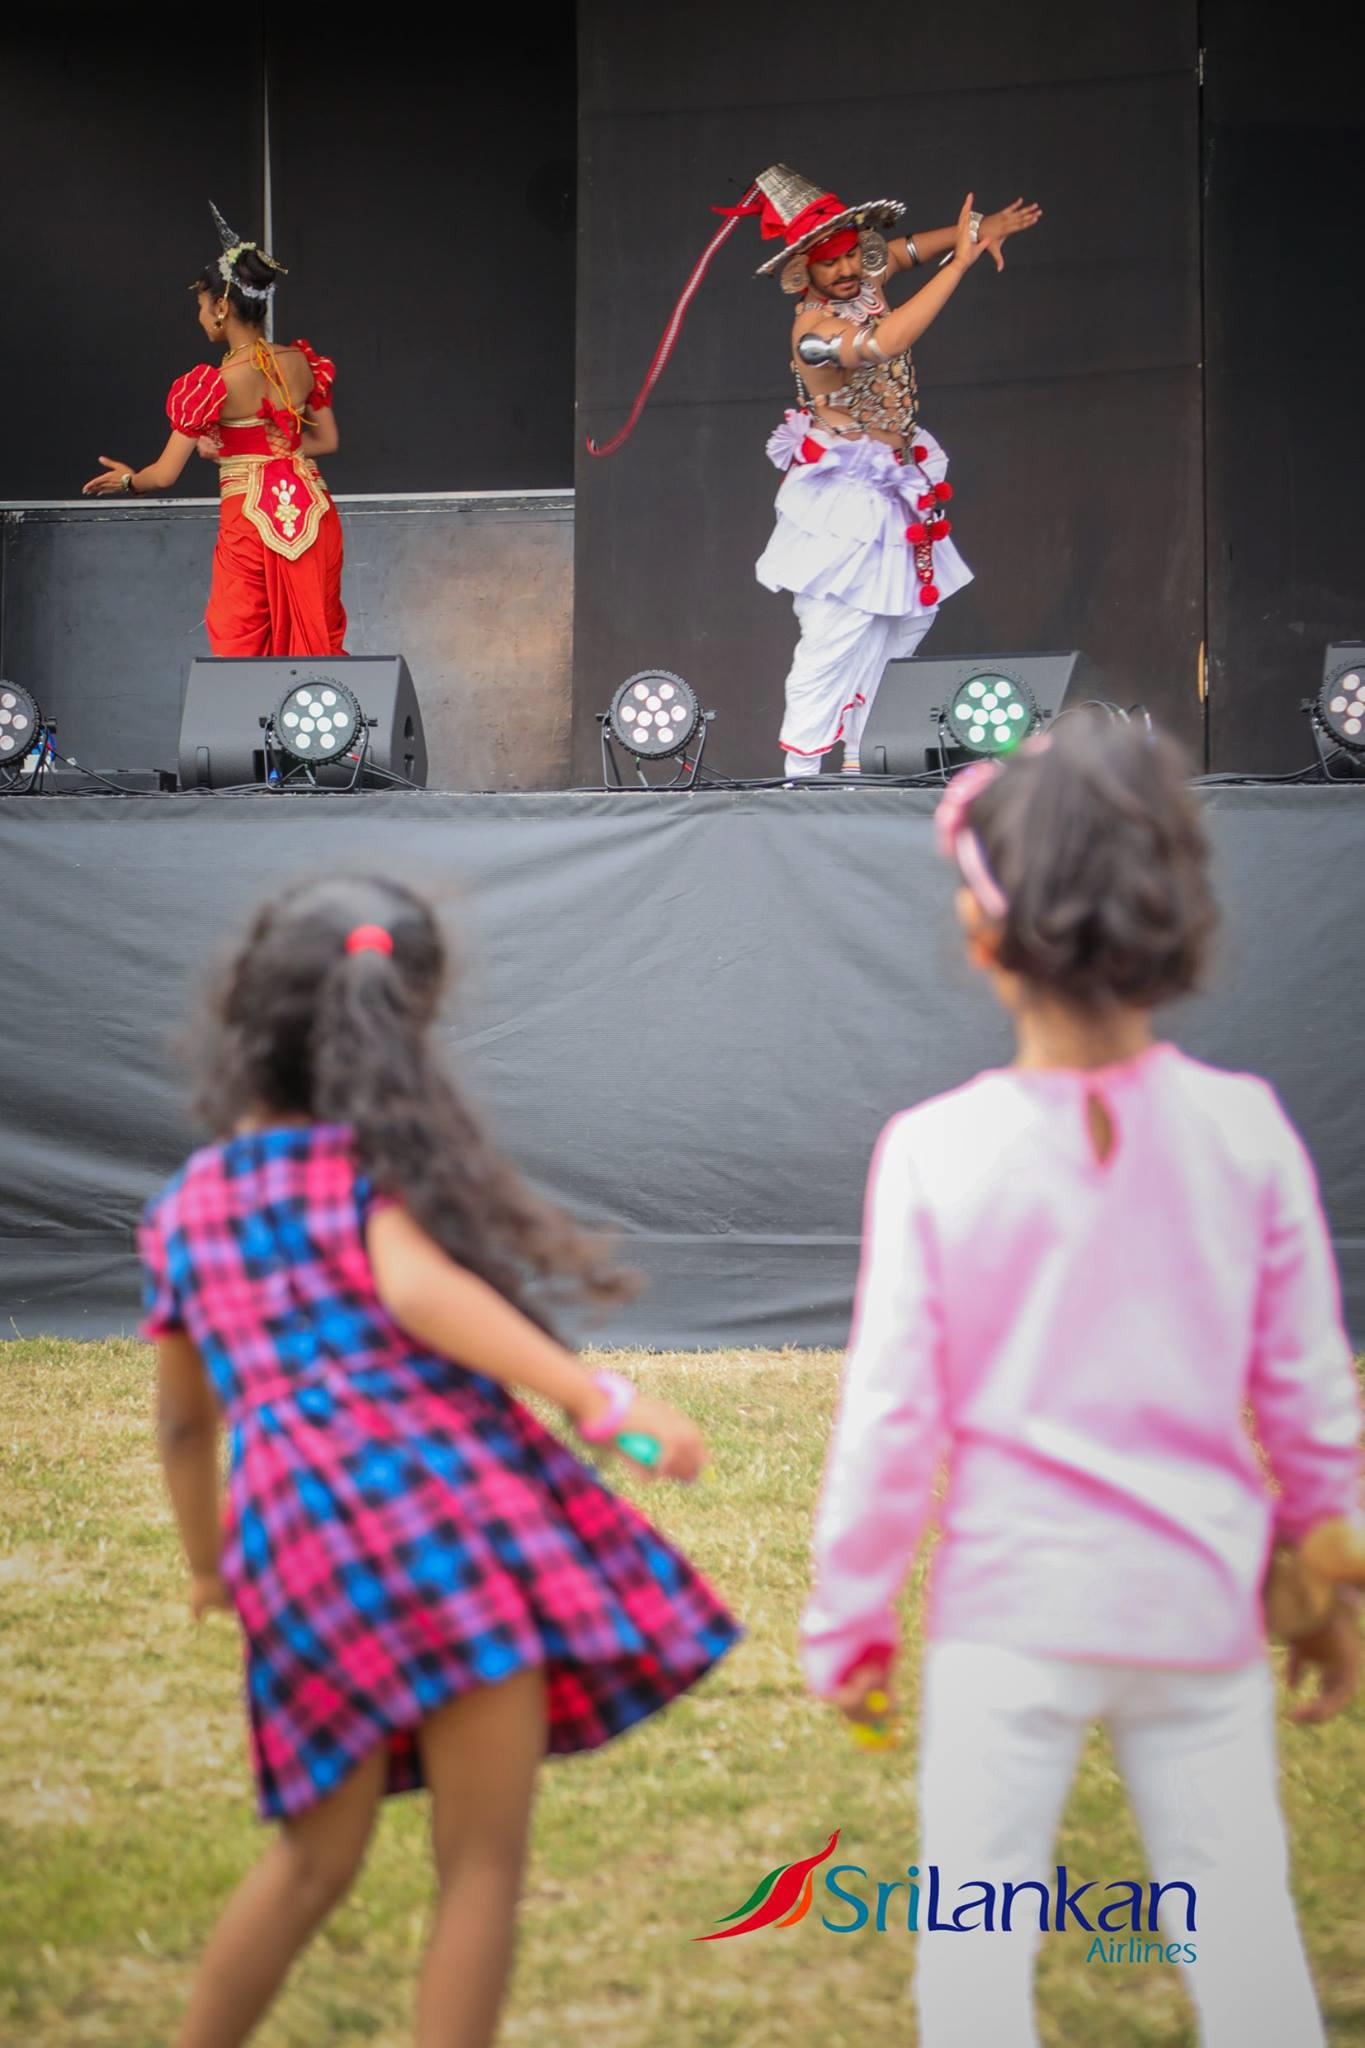 Sri-Lankan-airlines-cricket-festival-london-2017-natalia-smith--photography-7.jpg